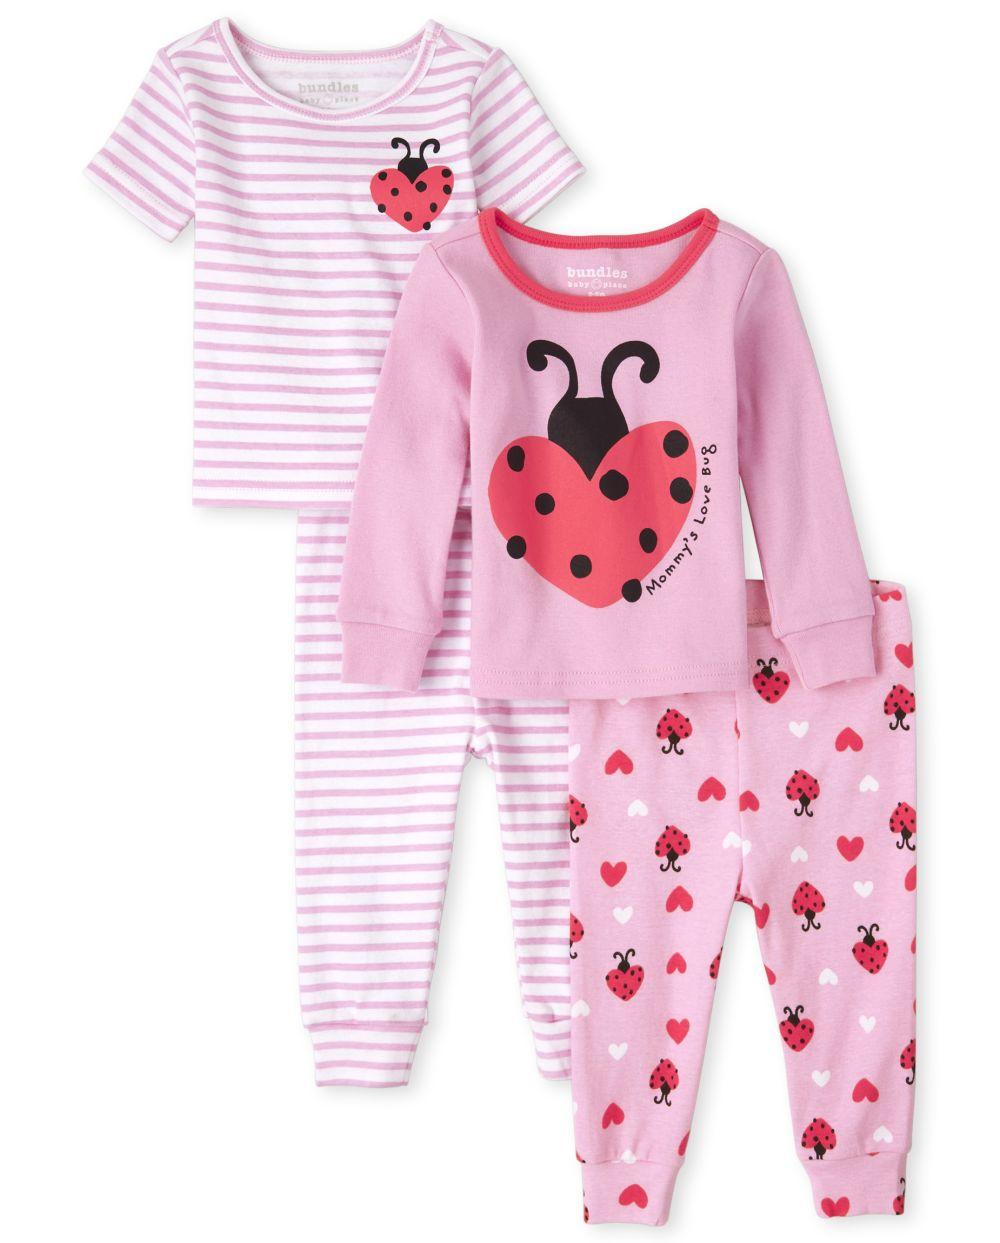 Baby And Toddler Girls Lady Bug Snug Fit Cotton 4-Piece Pajamas